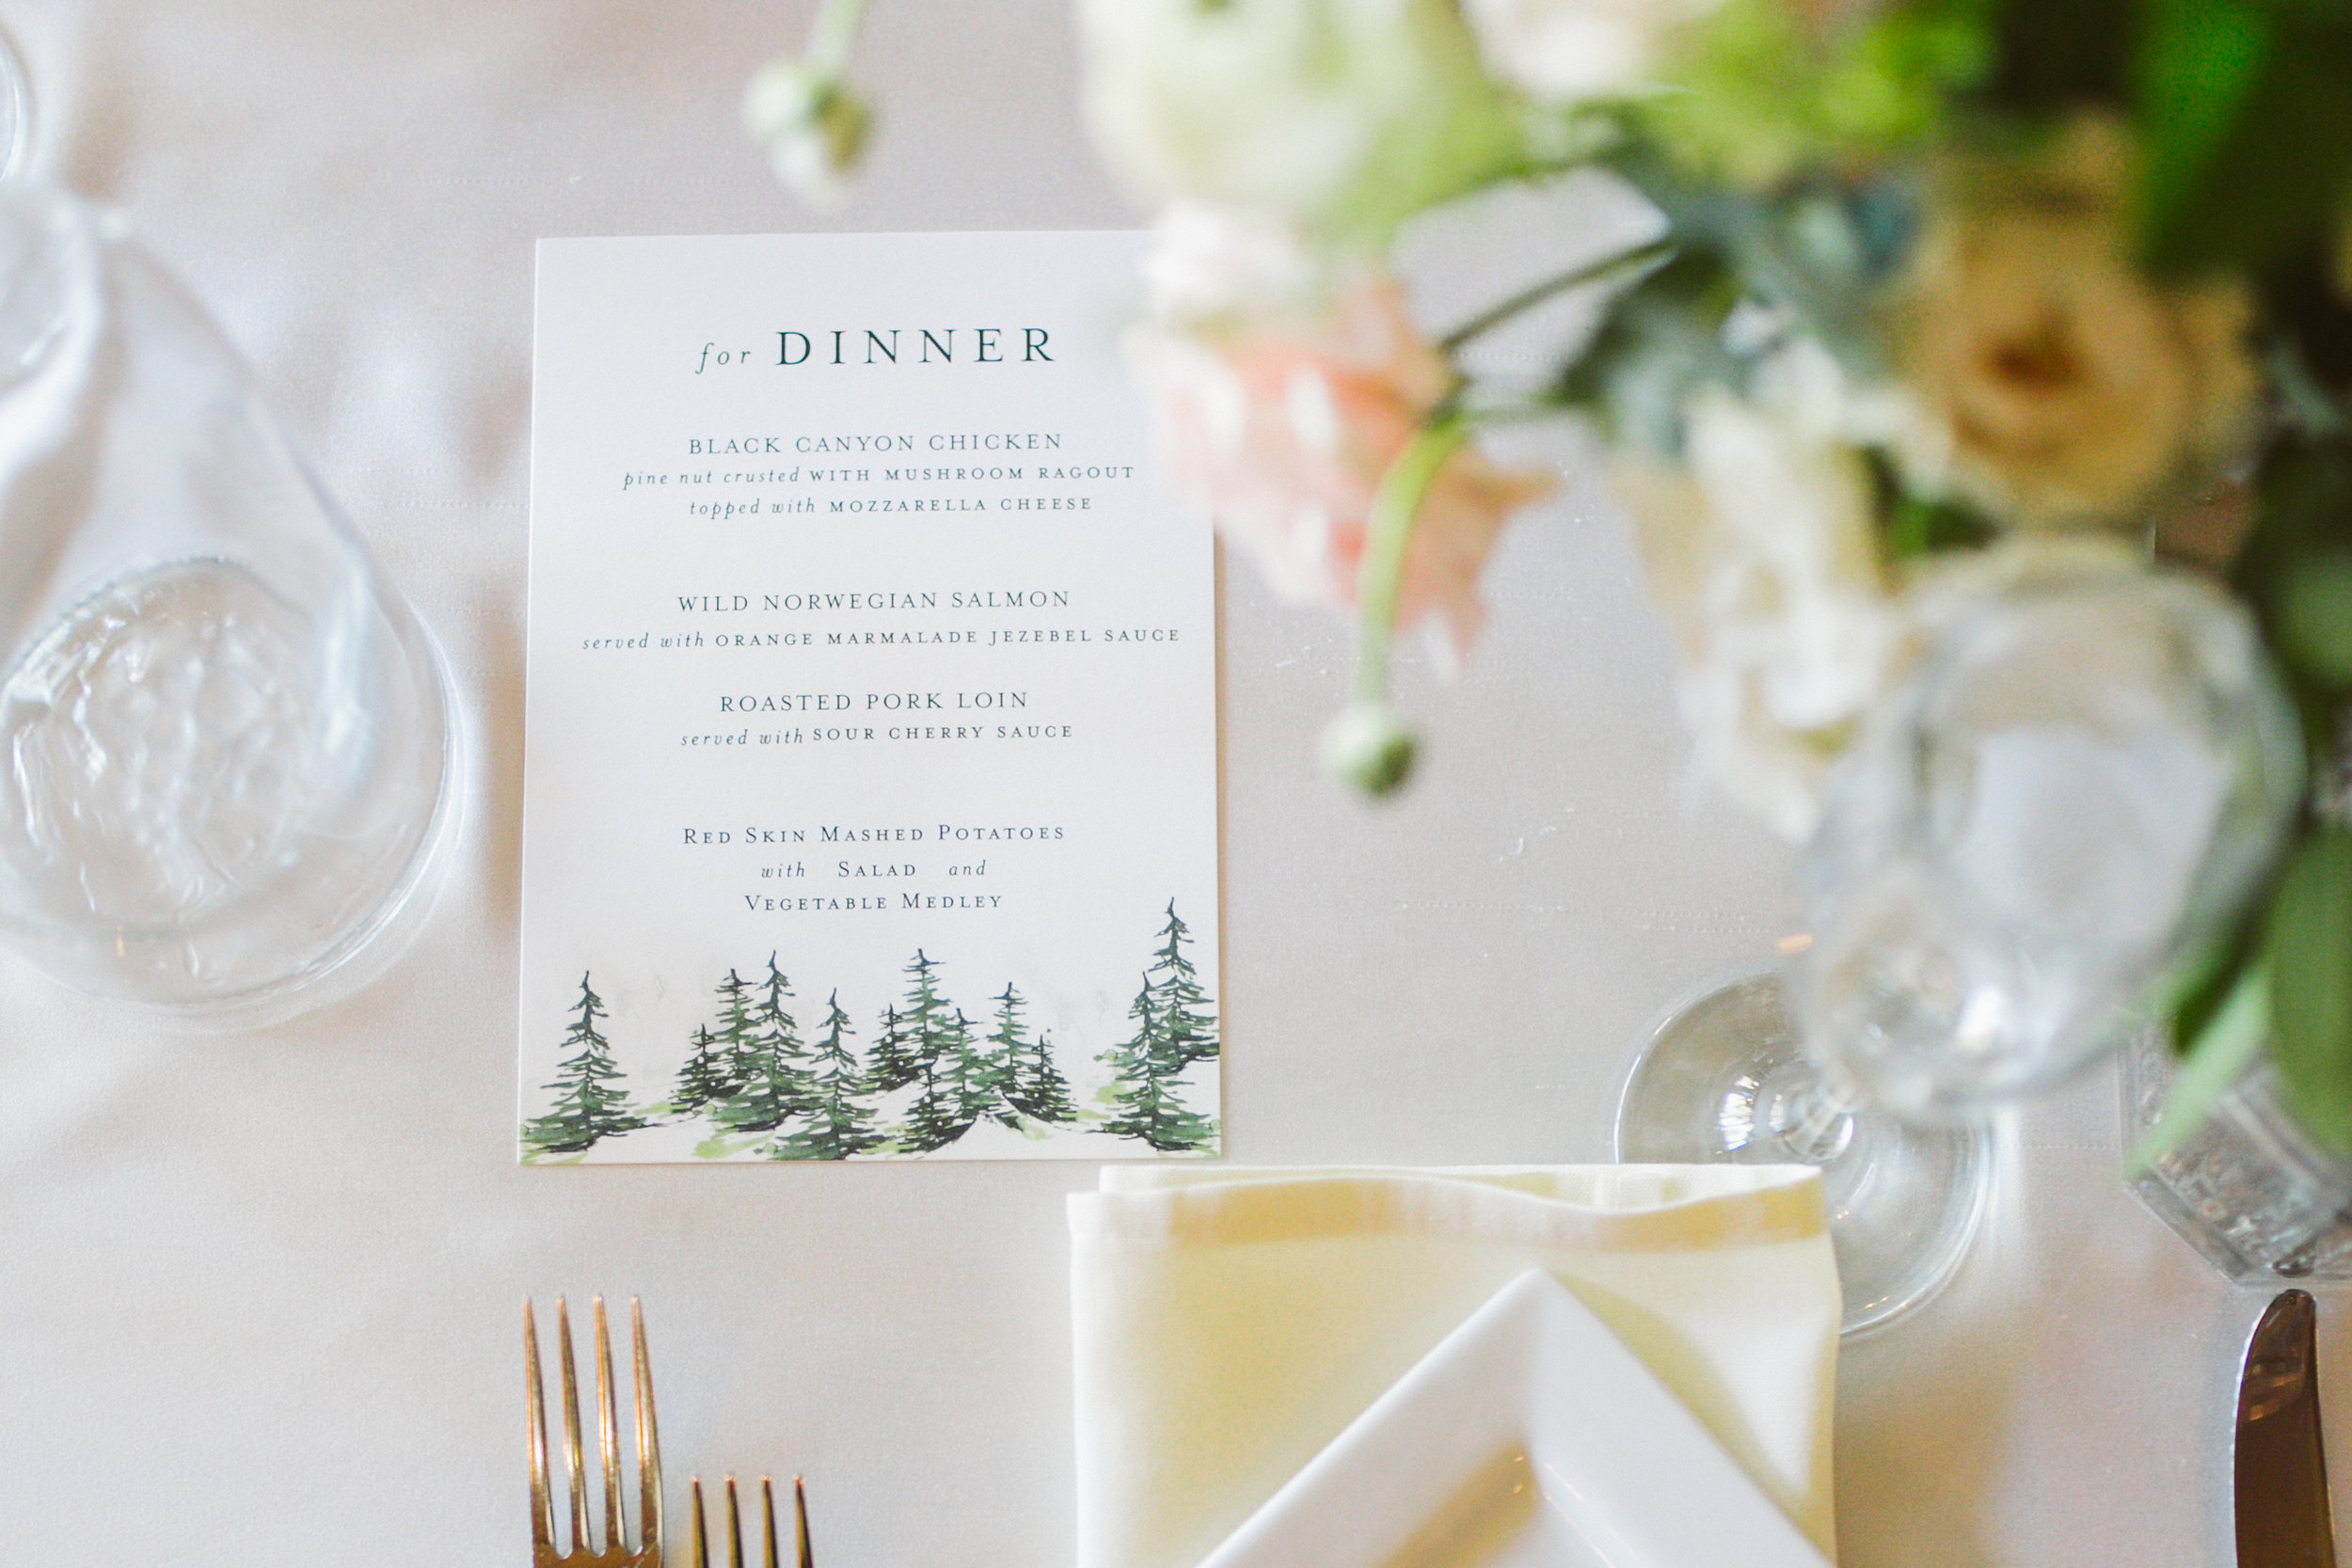 Twin_Owls_Steakhouse-wedding_photographer_Estes_Park_Lisa_ODwyer-566.jpg